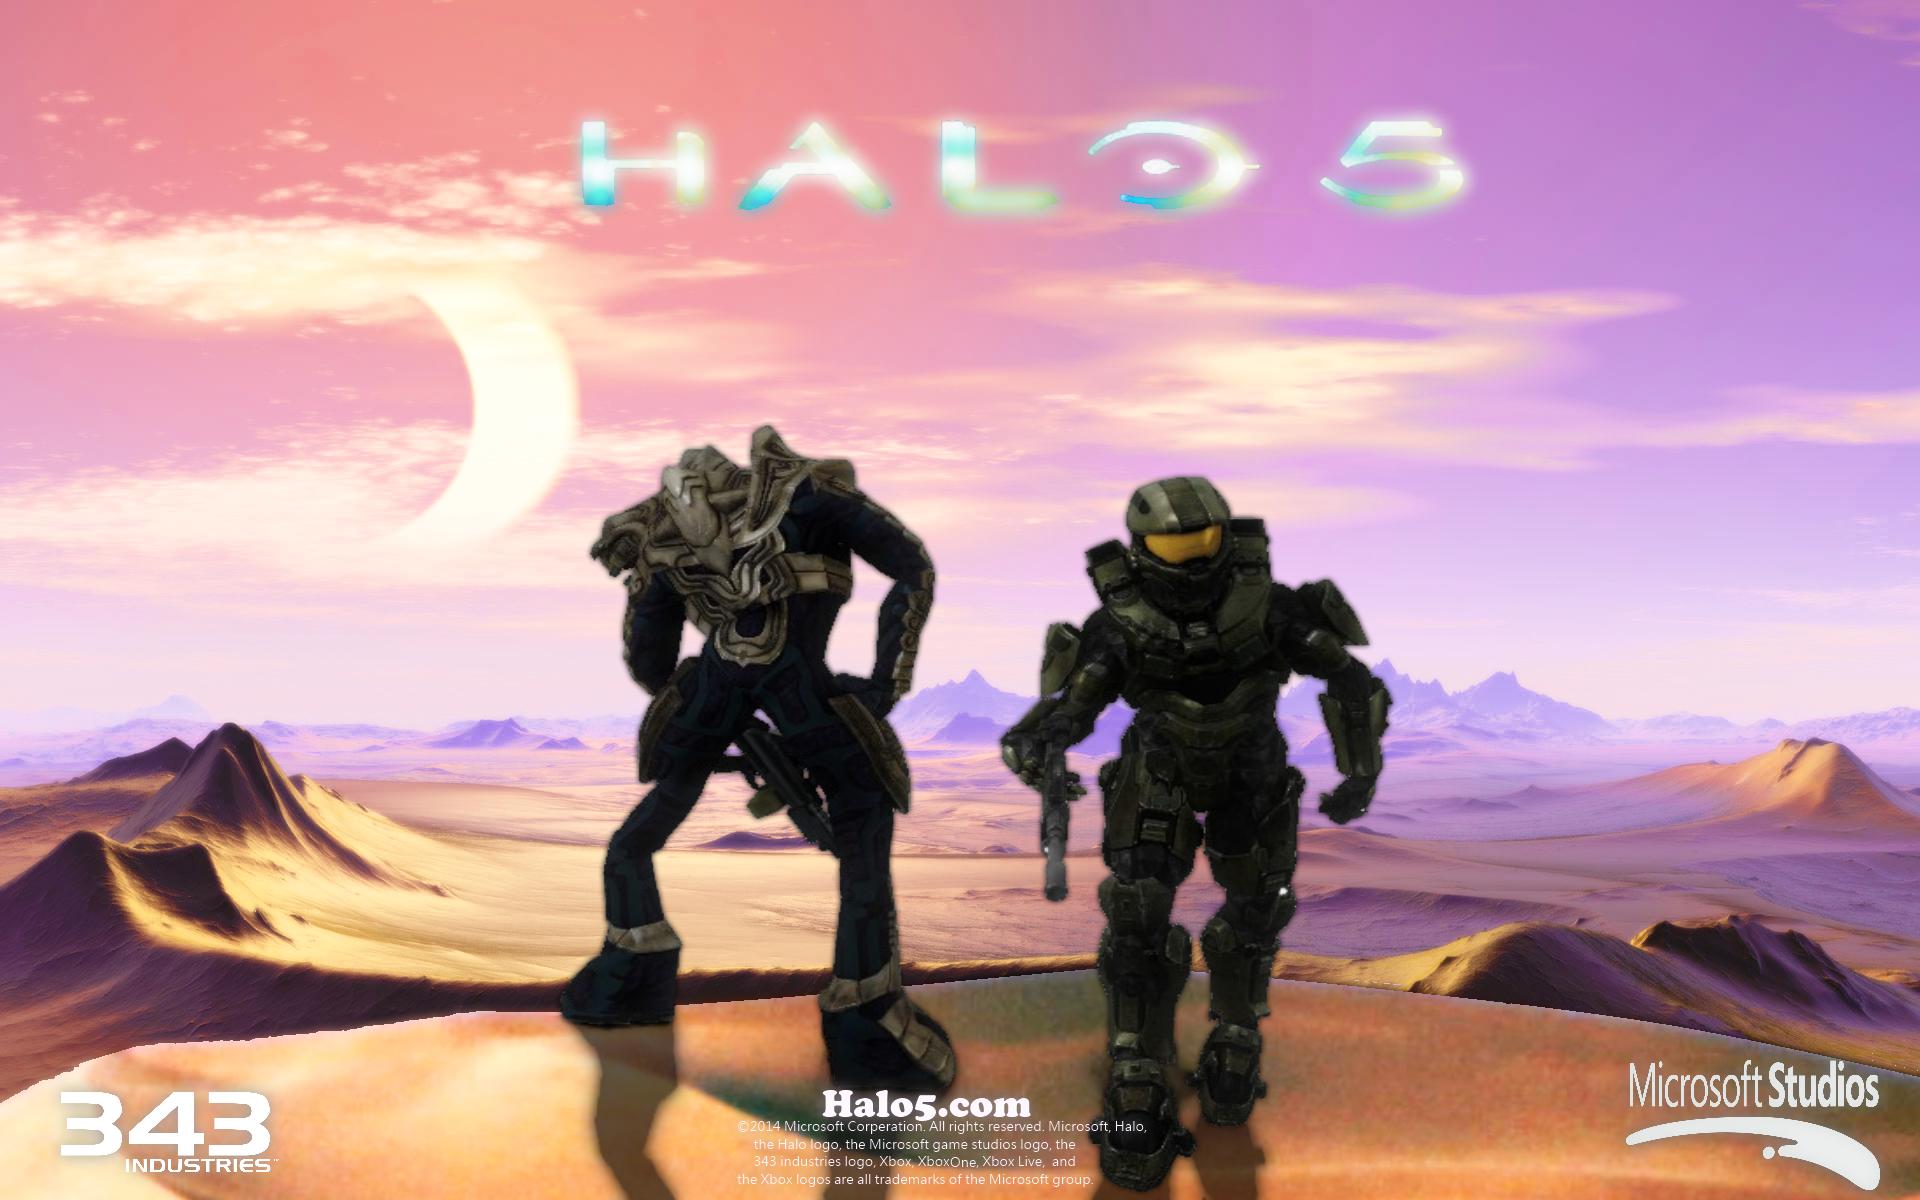 Halo 5 teaser poster by Ganitine on DeviantArt